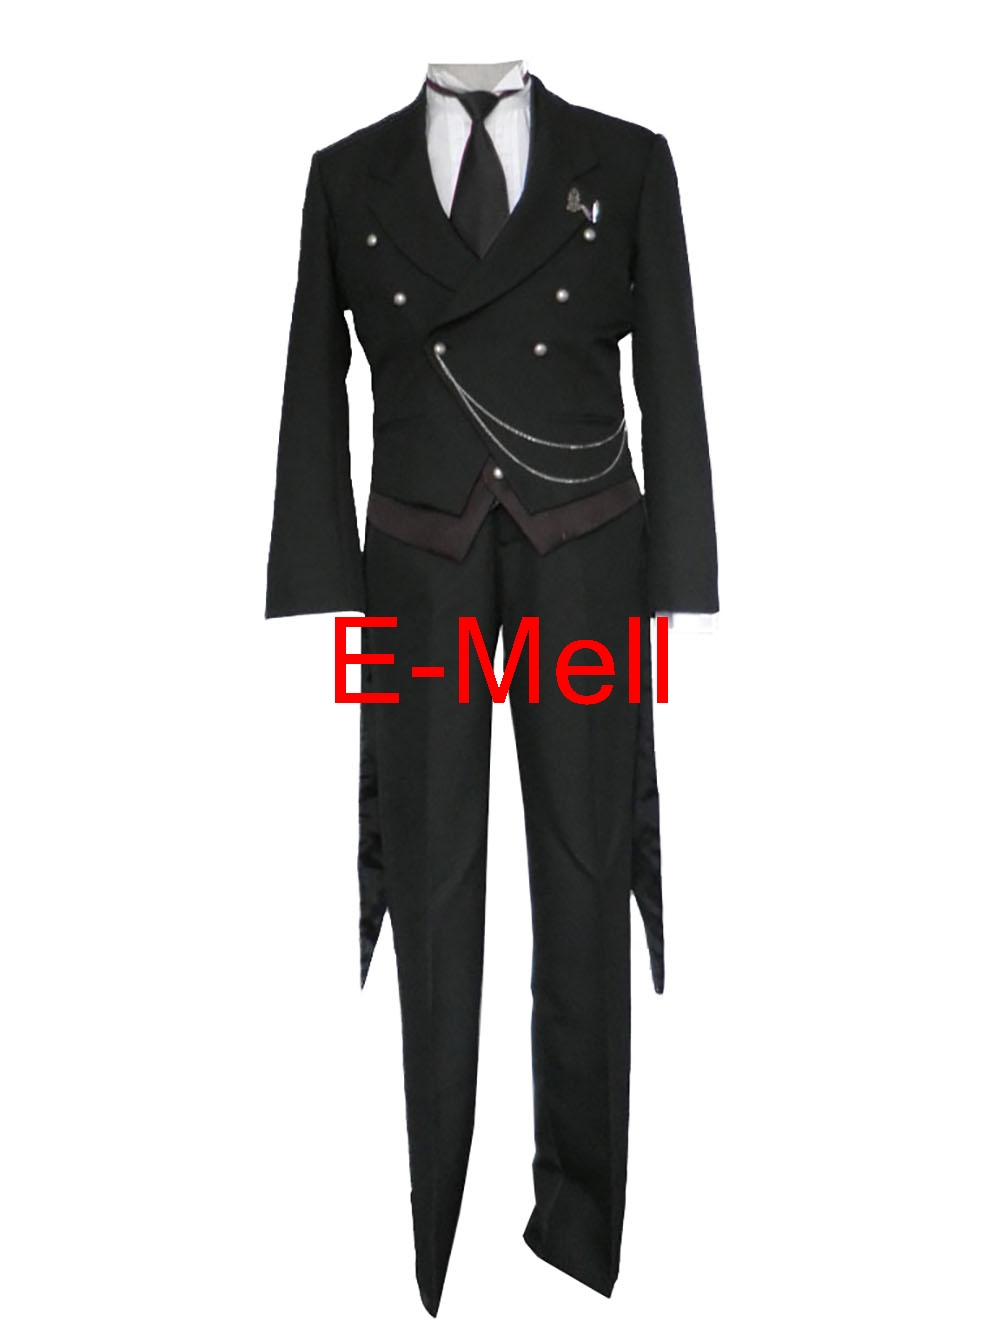 Black Butler Cosplay Sebastian Michaelis uniforms font b suit b font 1 generation swallow tailed coat